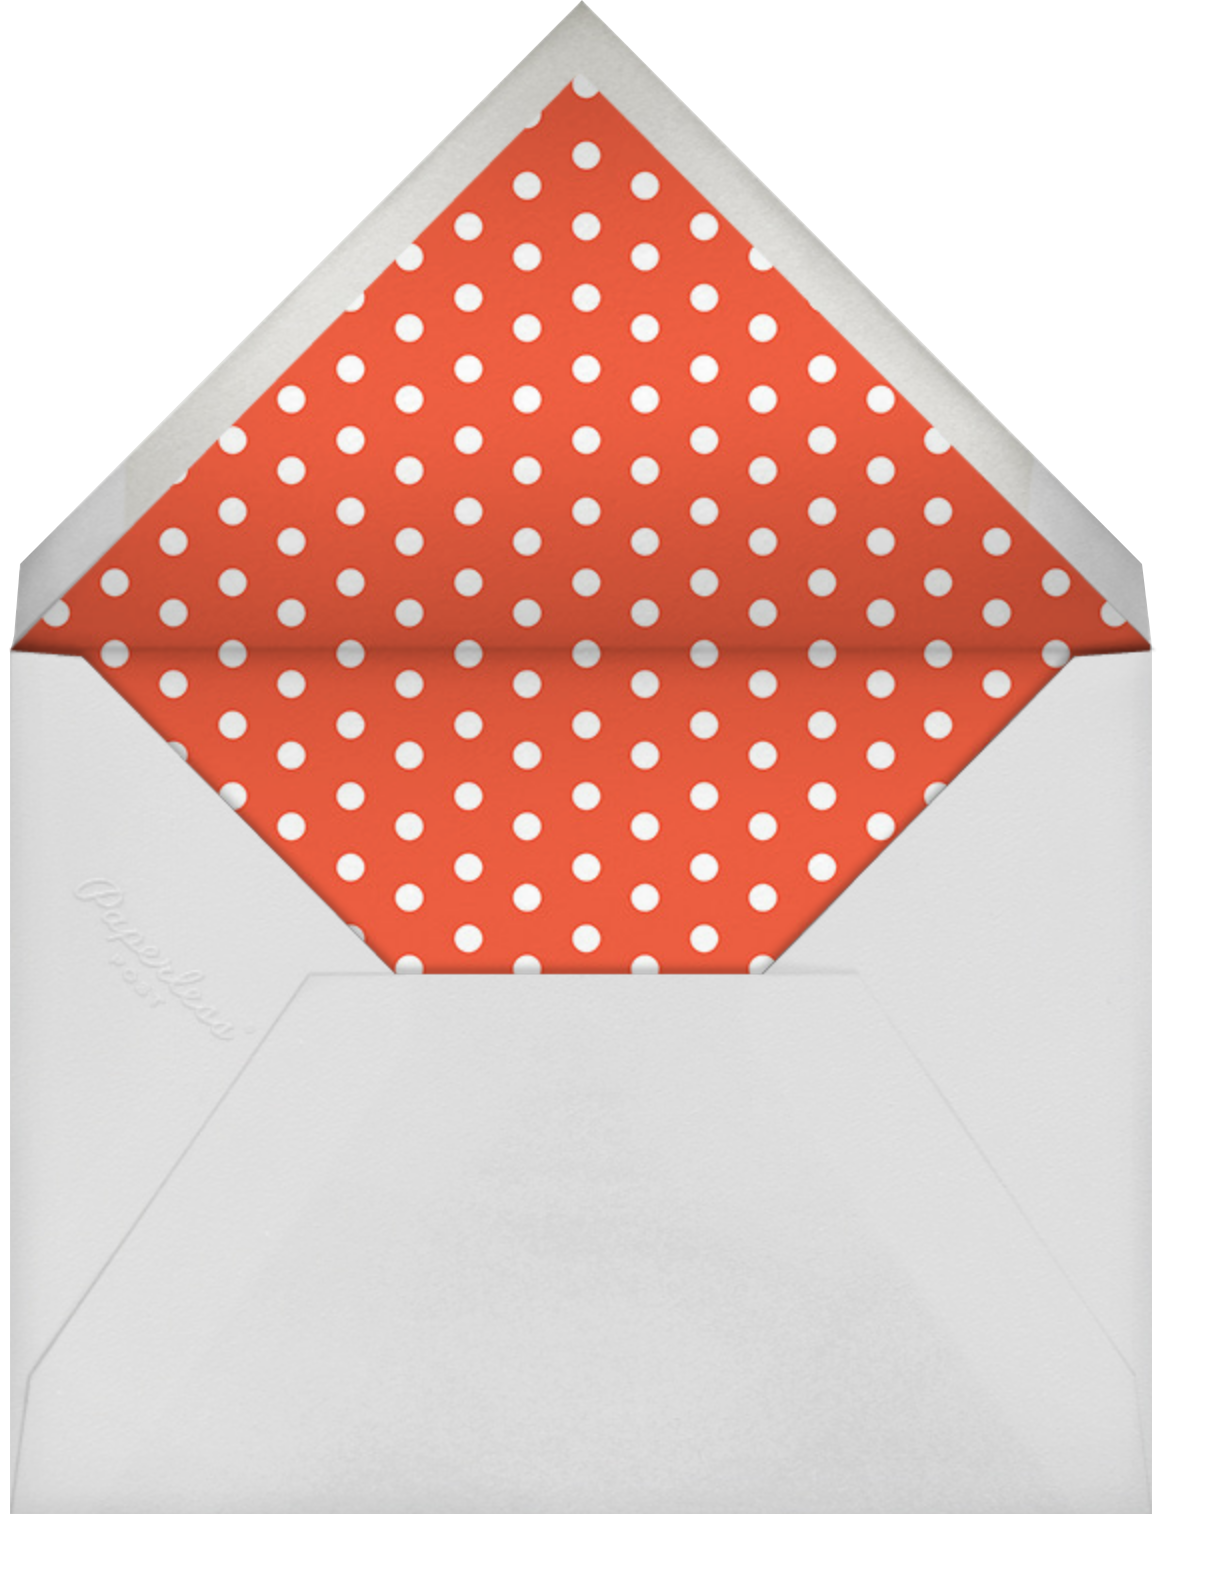 Boatload of Love - Rifle Paper Co. - Valentine's Day - envelope back